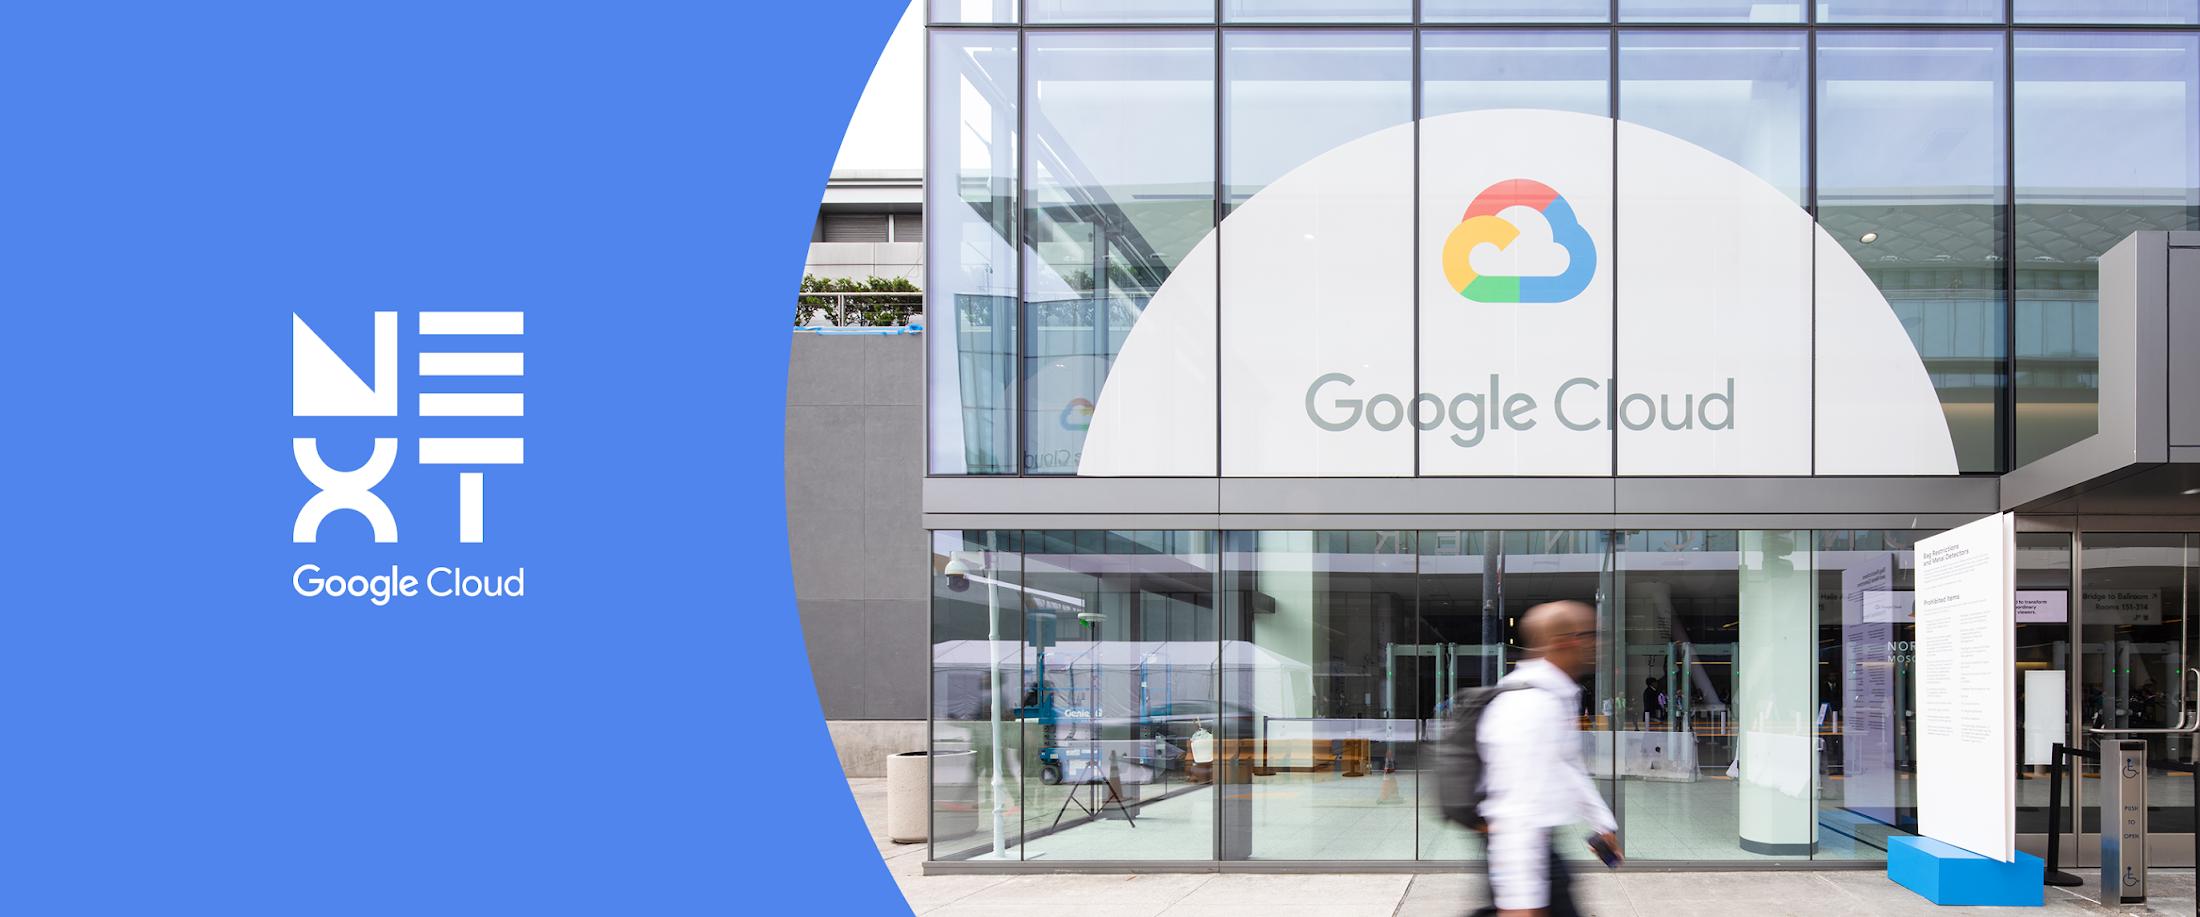 Google Cloud Platform Japan 公式ブログ: Google Cloud Next '19 2 日目